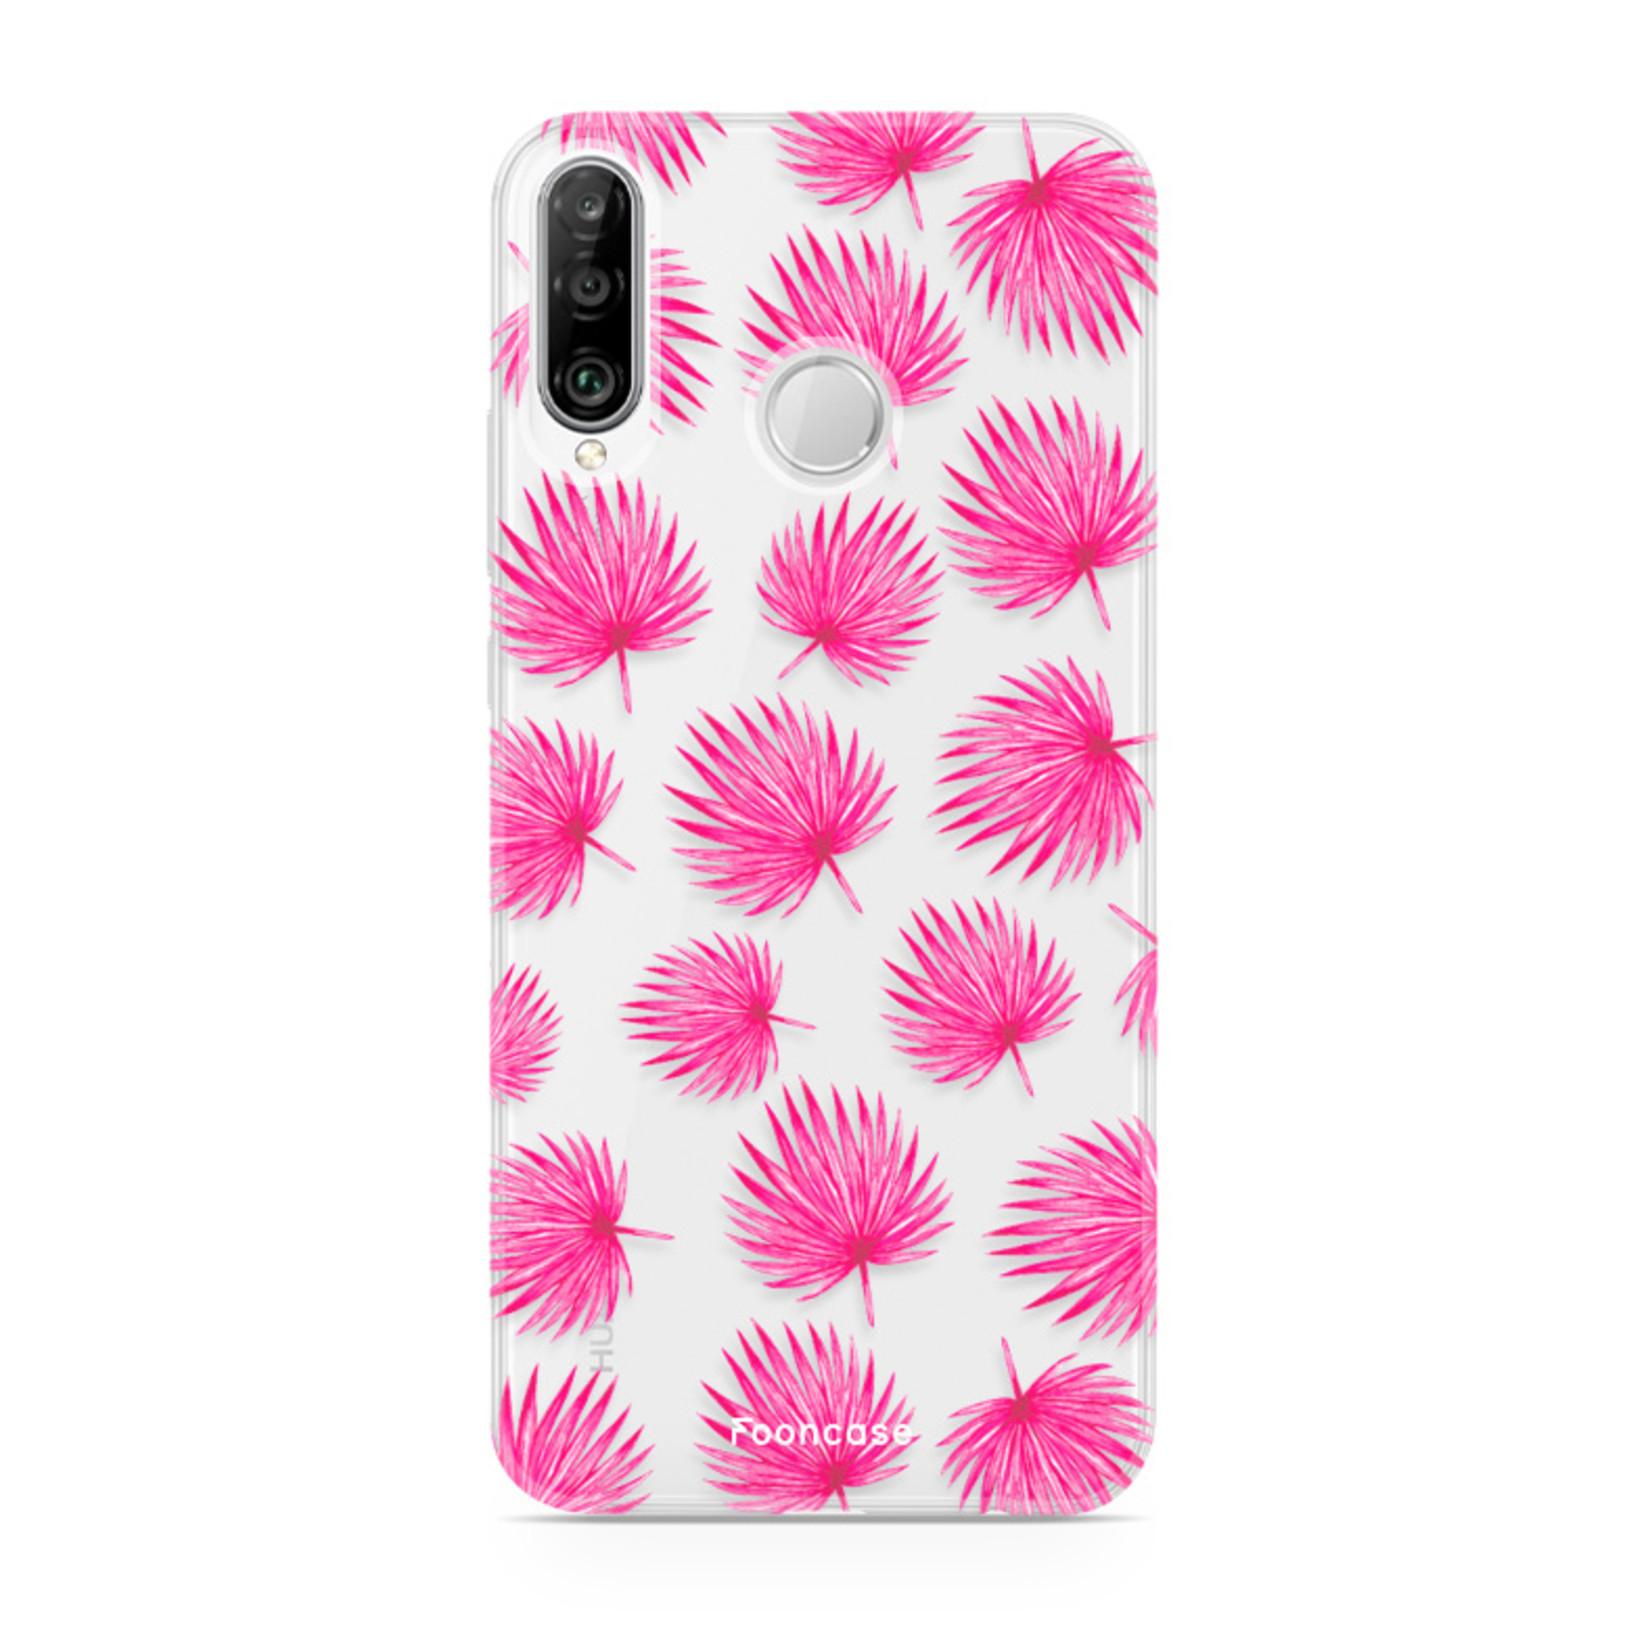 FOONCASE Huawei P30 Lite hoesje TPU Soft Case - Back Cover - Pink leaves / Roze bladeren